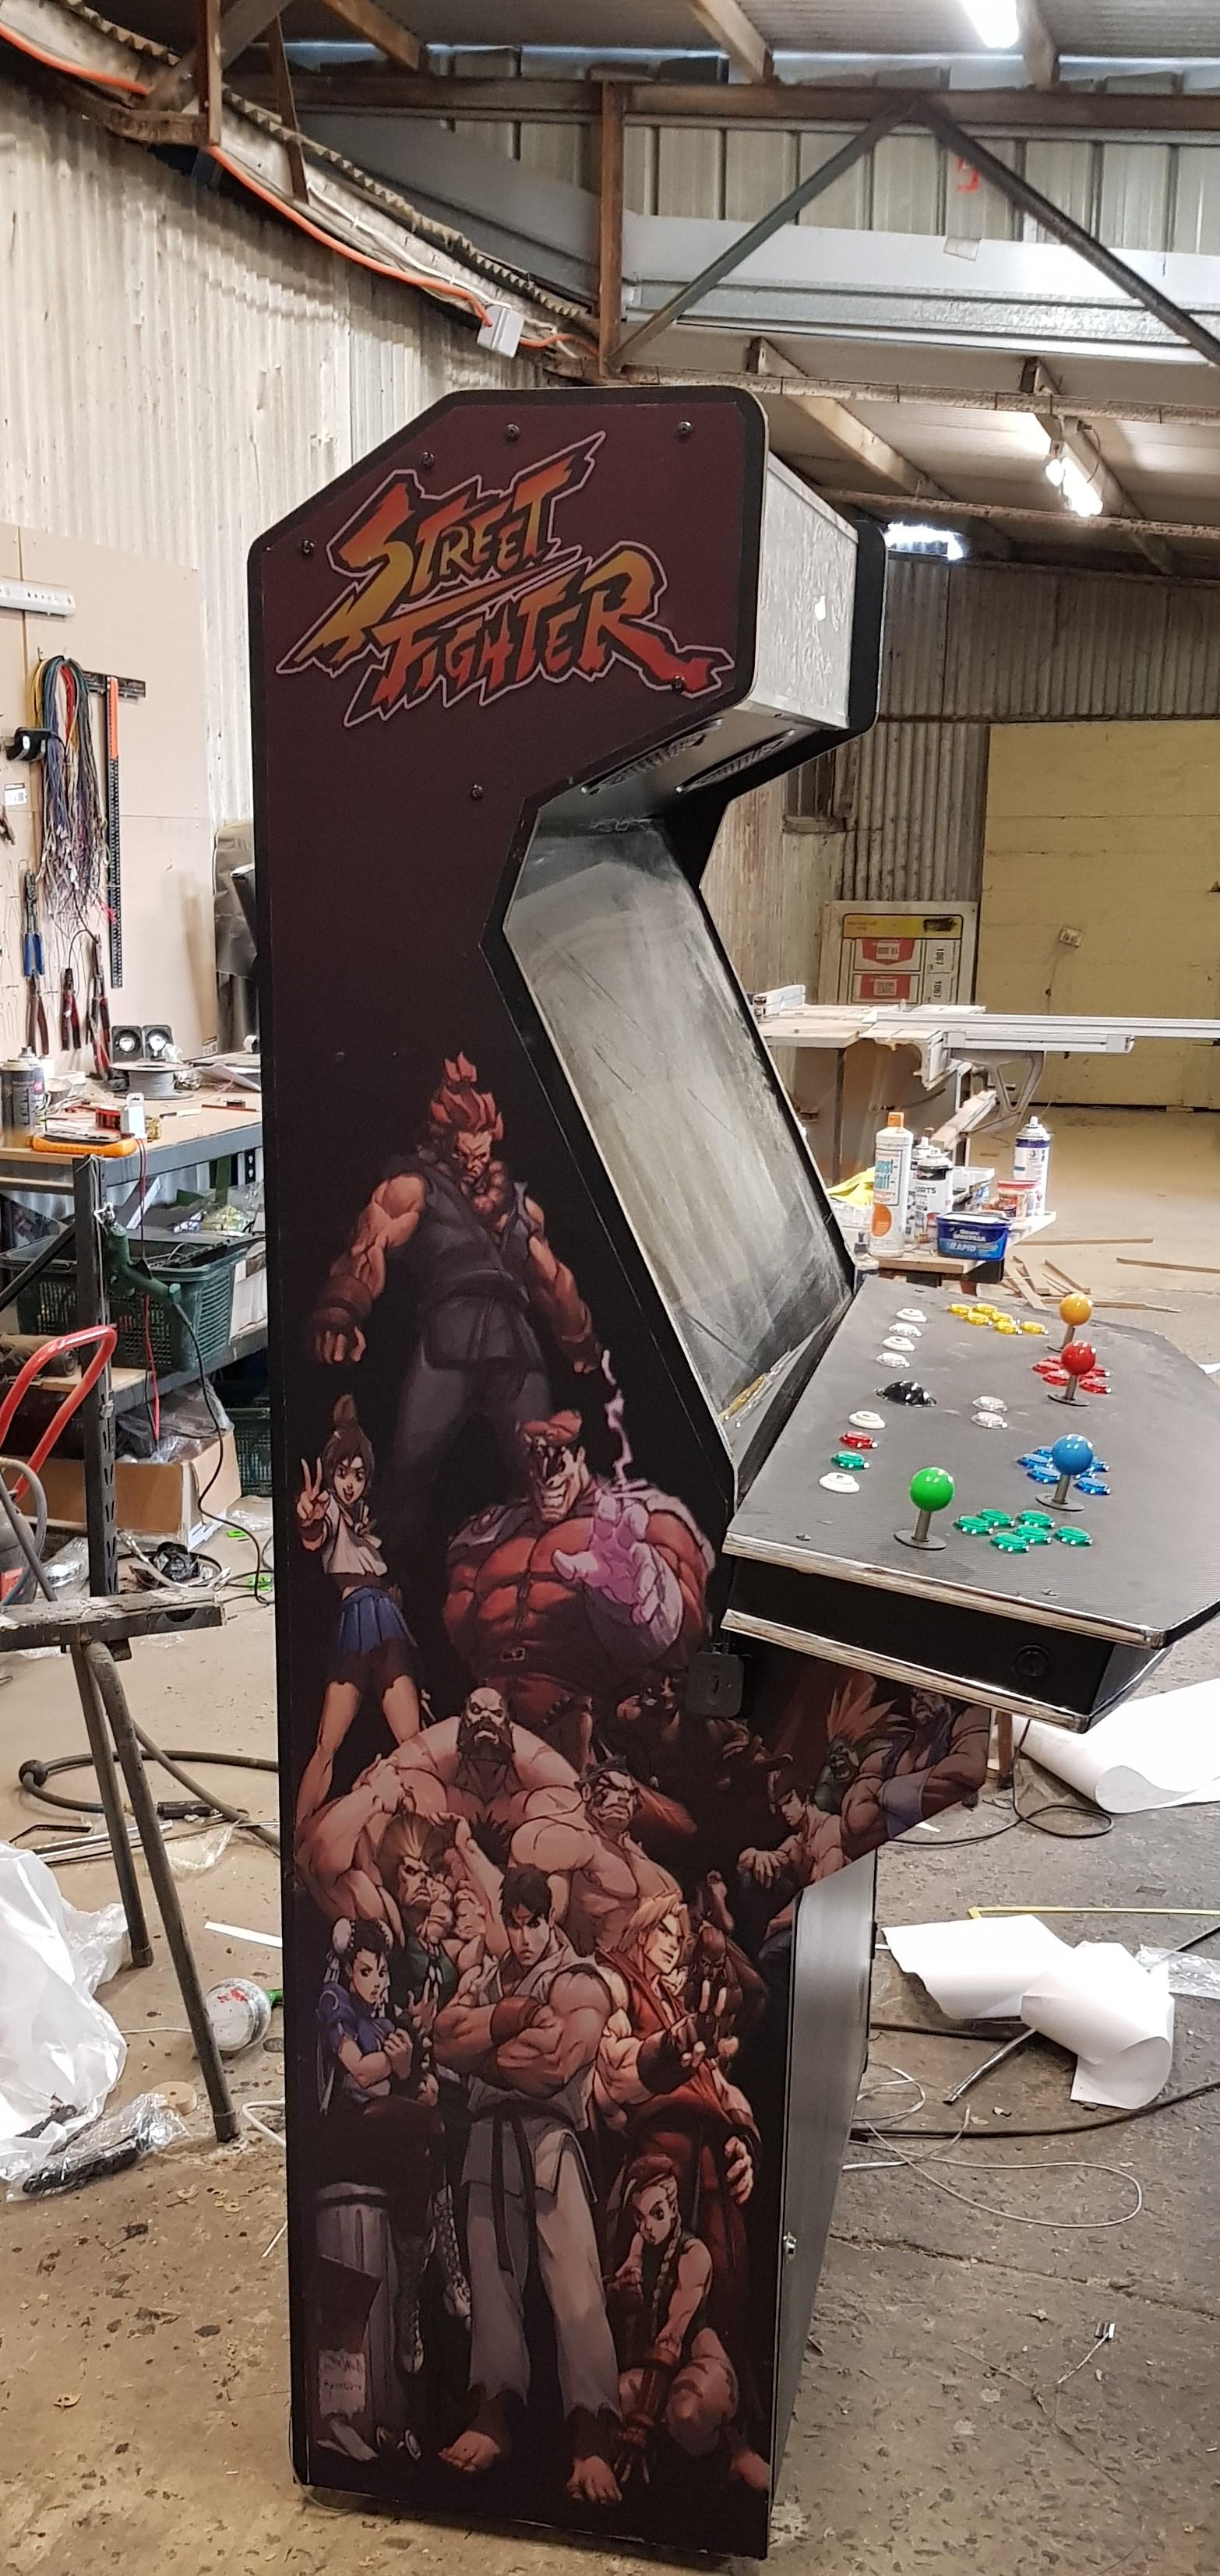 4 player arcade